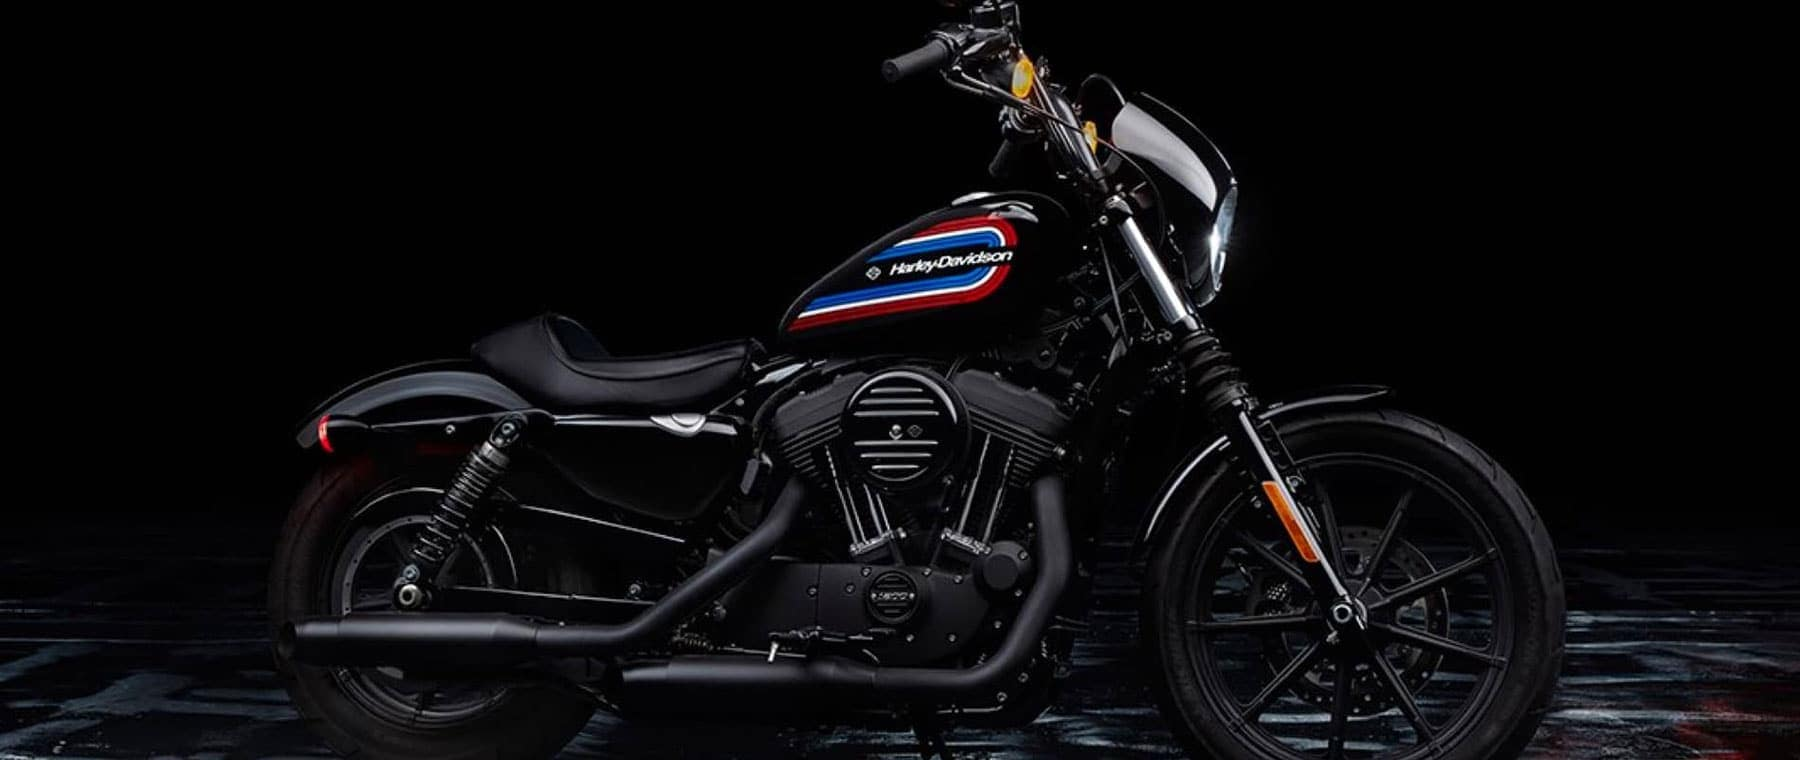 Harley-Davidson bike